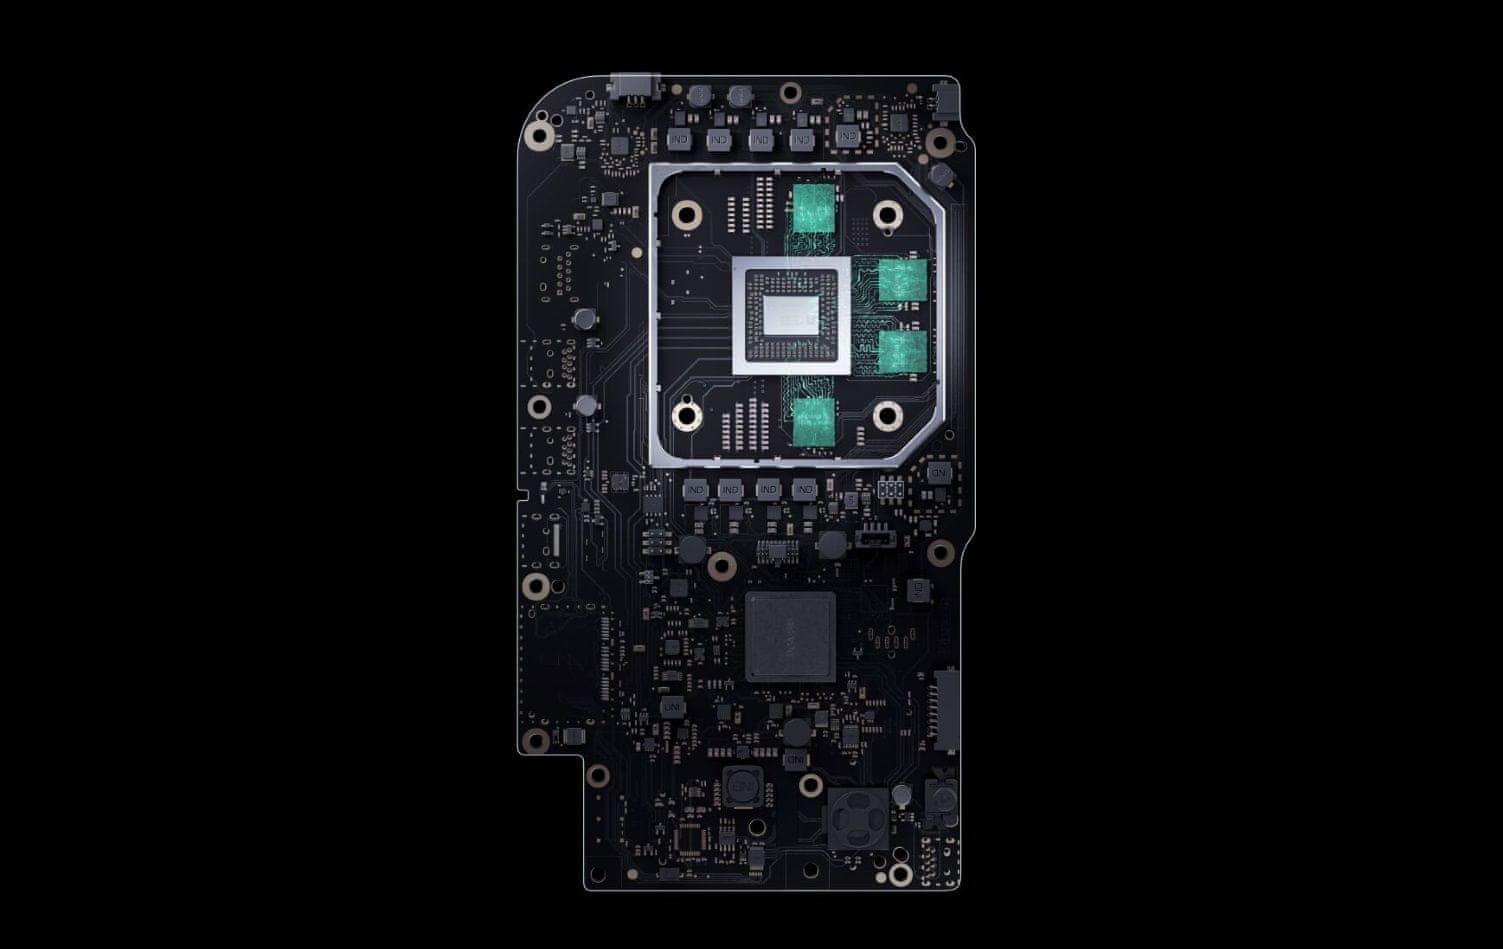 Konzole Microsoft Xbox Series X SSD Velocity architecture 4K 8K 12 FLOPS AMD